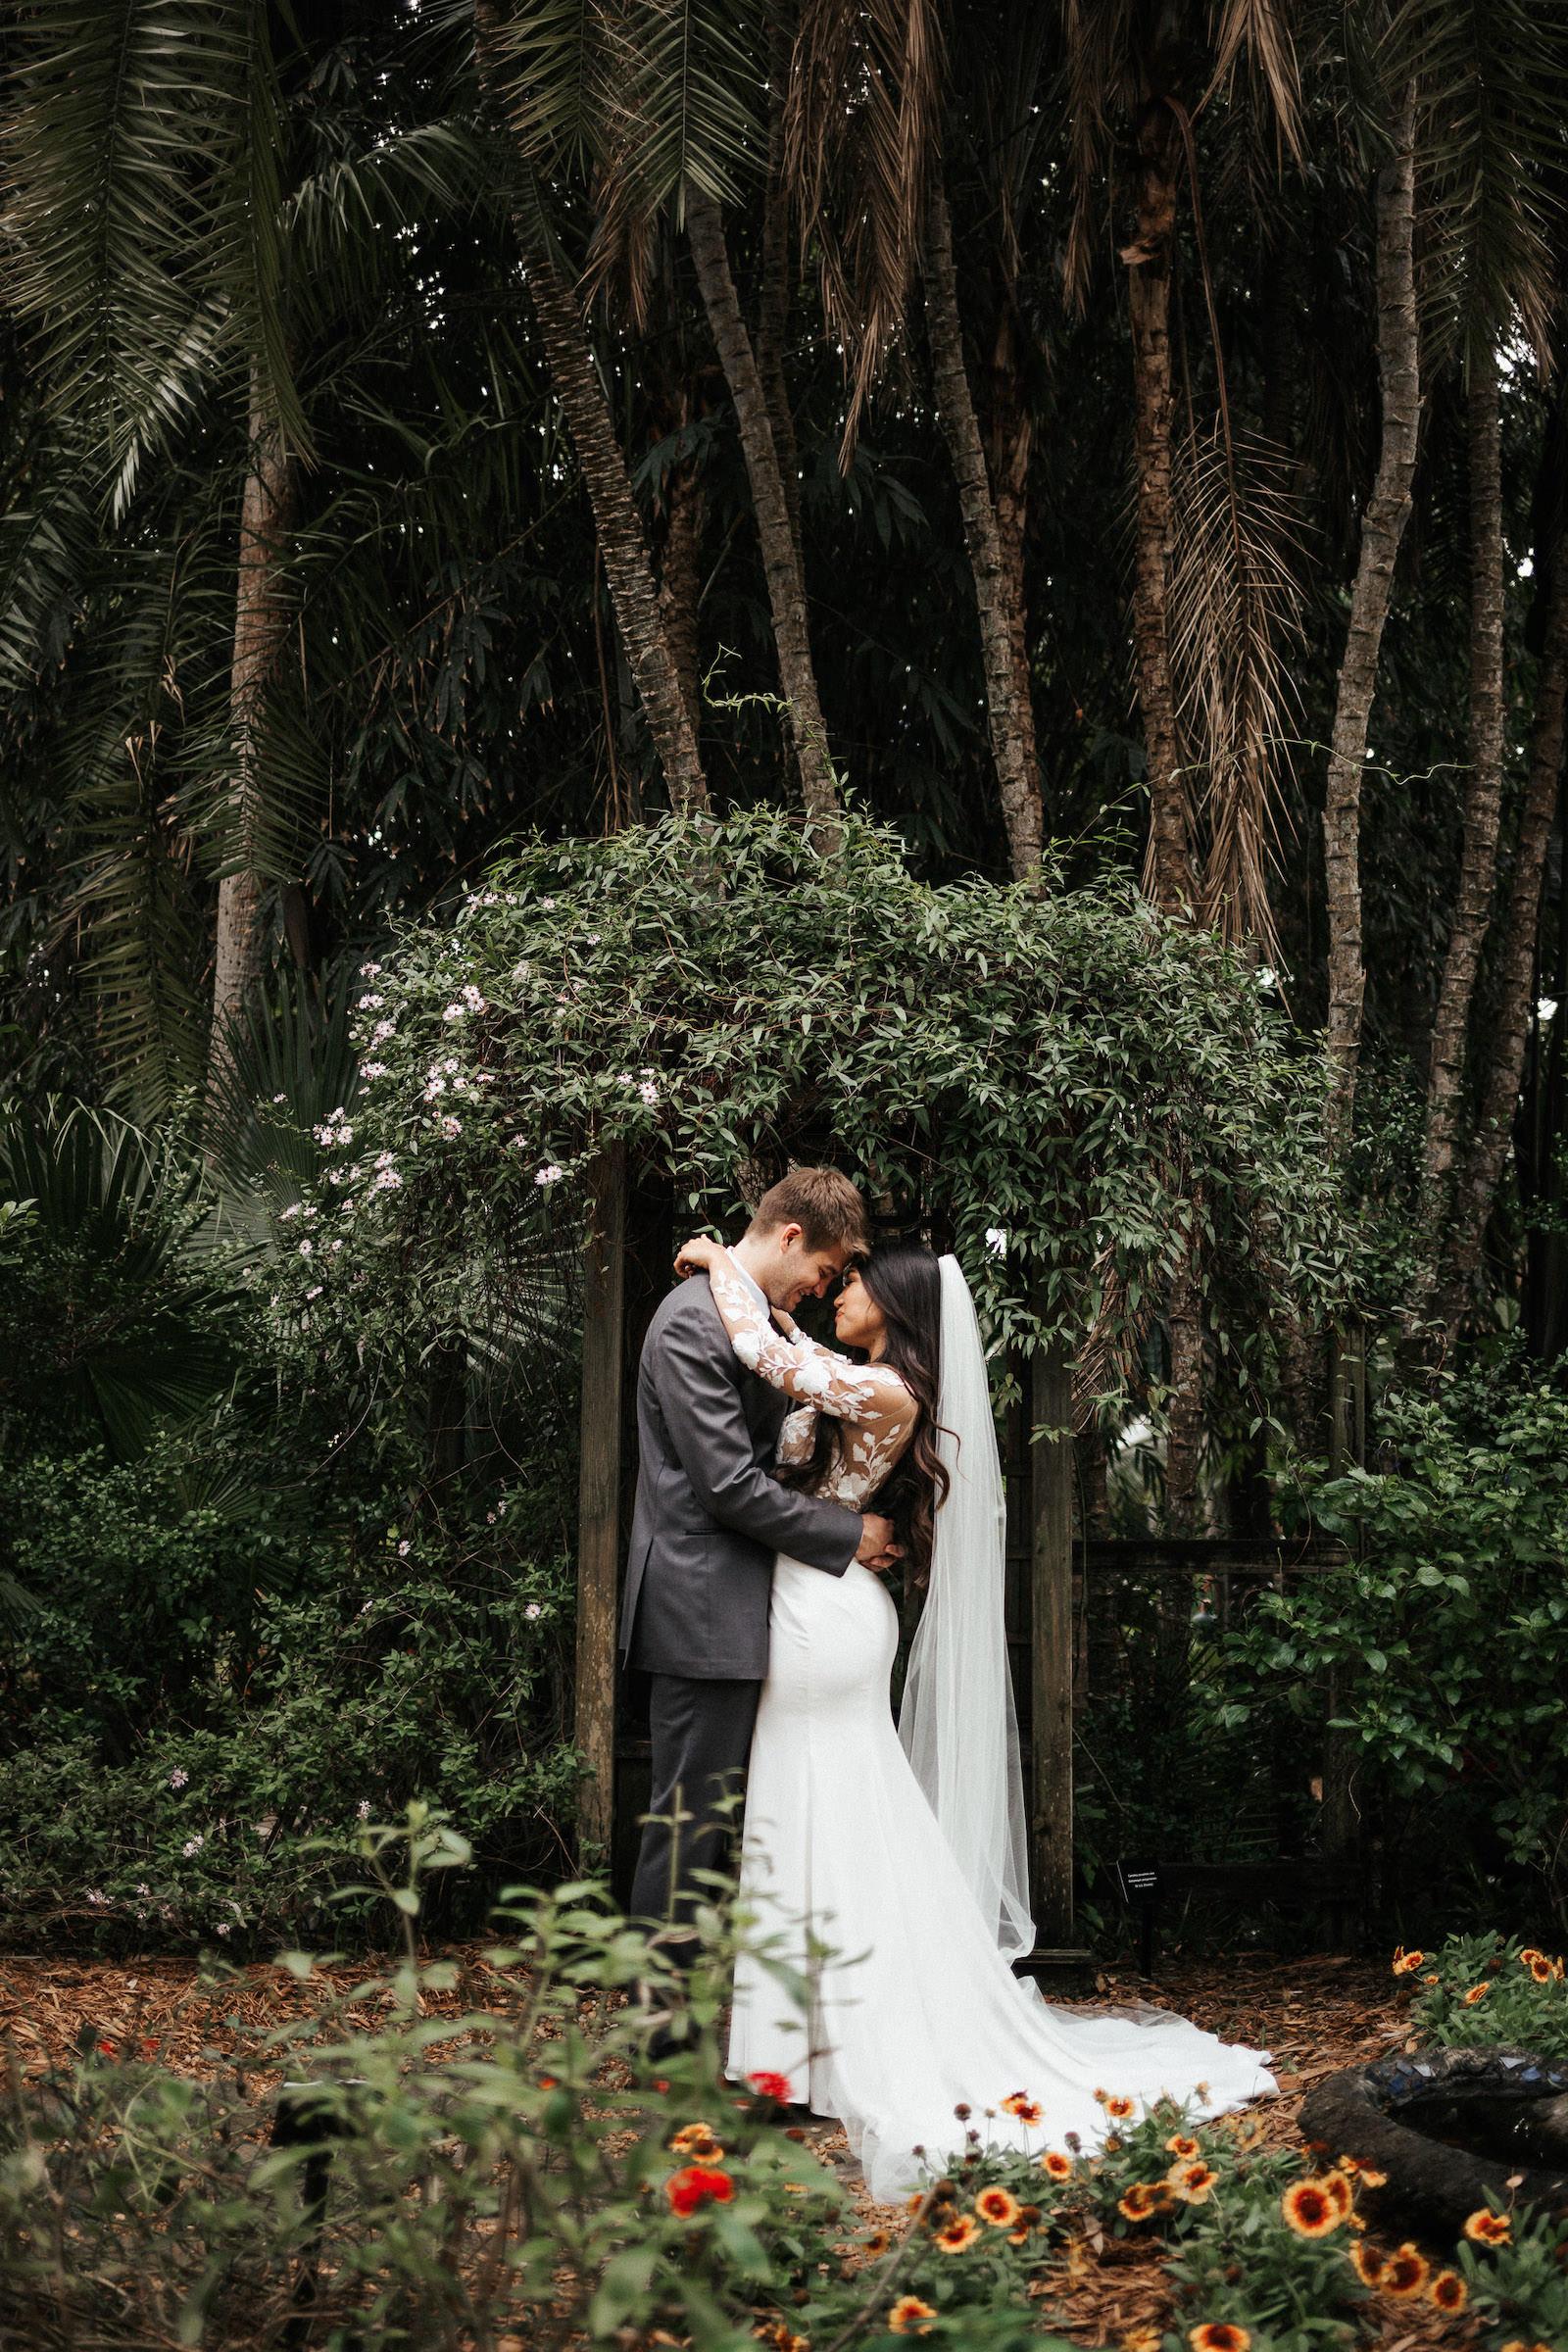 Tropical Elegant Inspired Florida Bride and Groom at Sunken Gardens in St. Petersburg, Bride Wearing BHLDN Wedding Dress | Tampa Bay Wedding Planner John Campbell Weddings